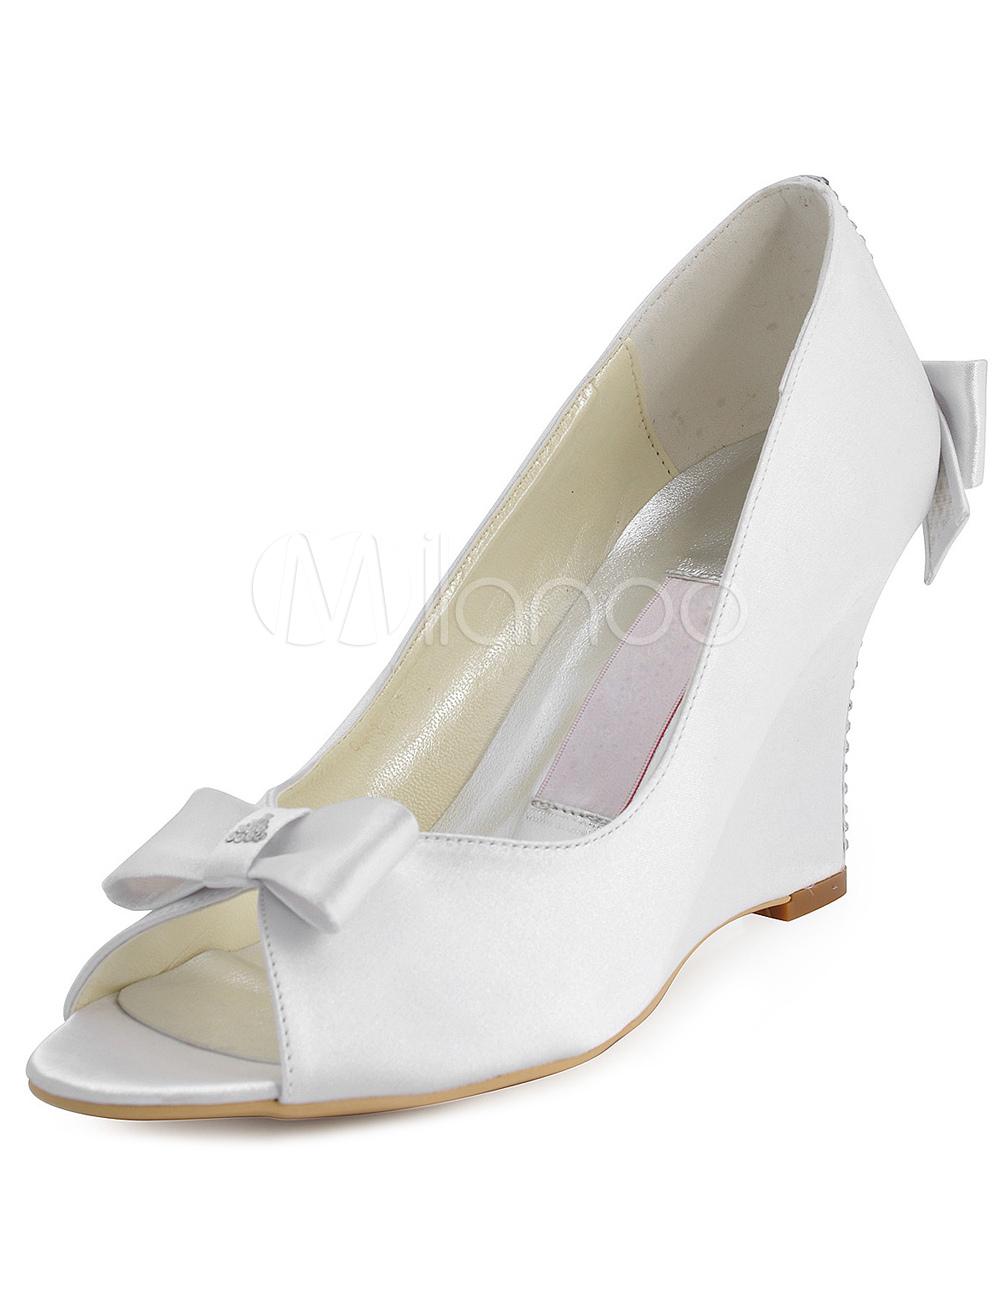 talon compens chaussures de mariage - Chaussure Mariage Compense